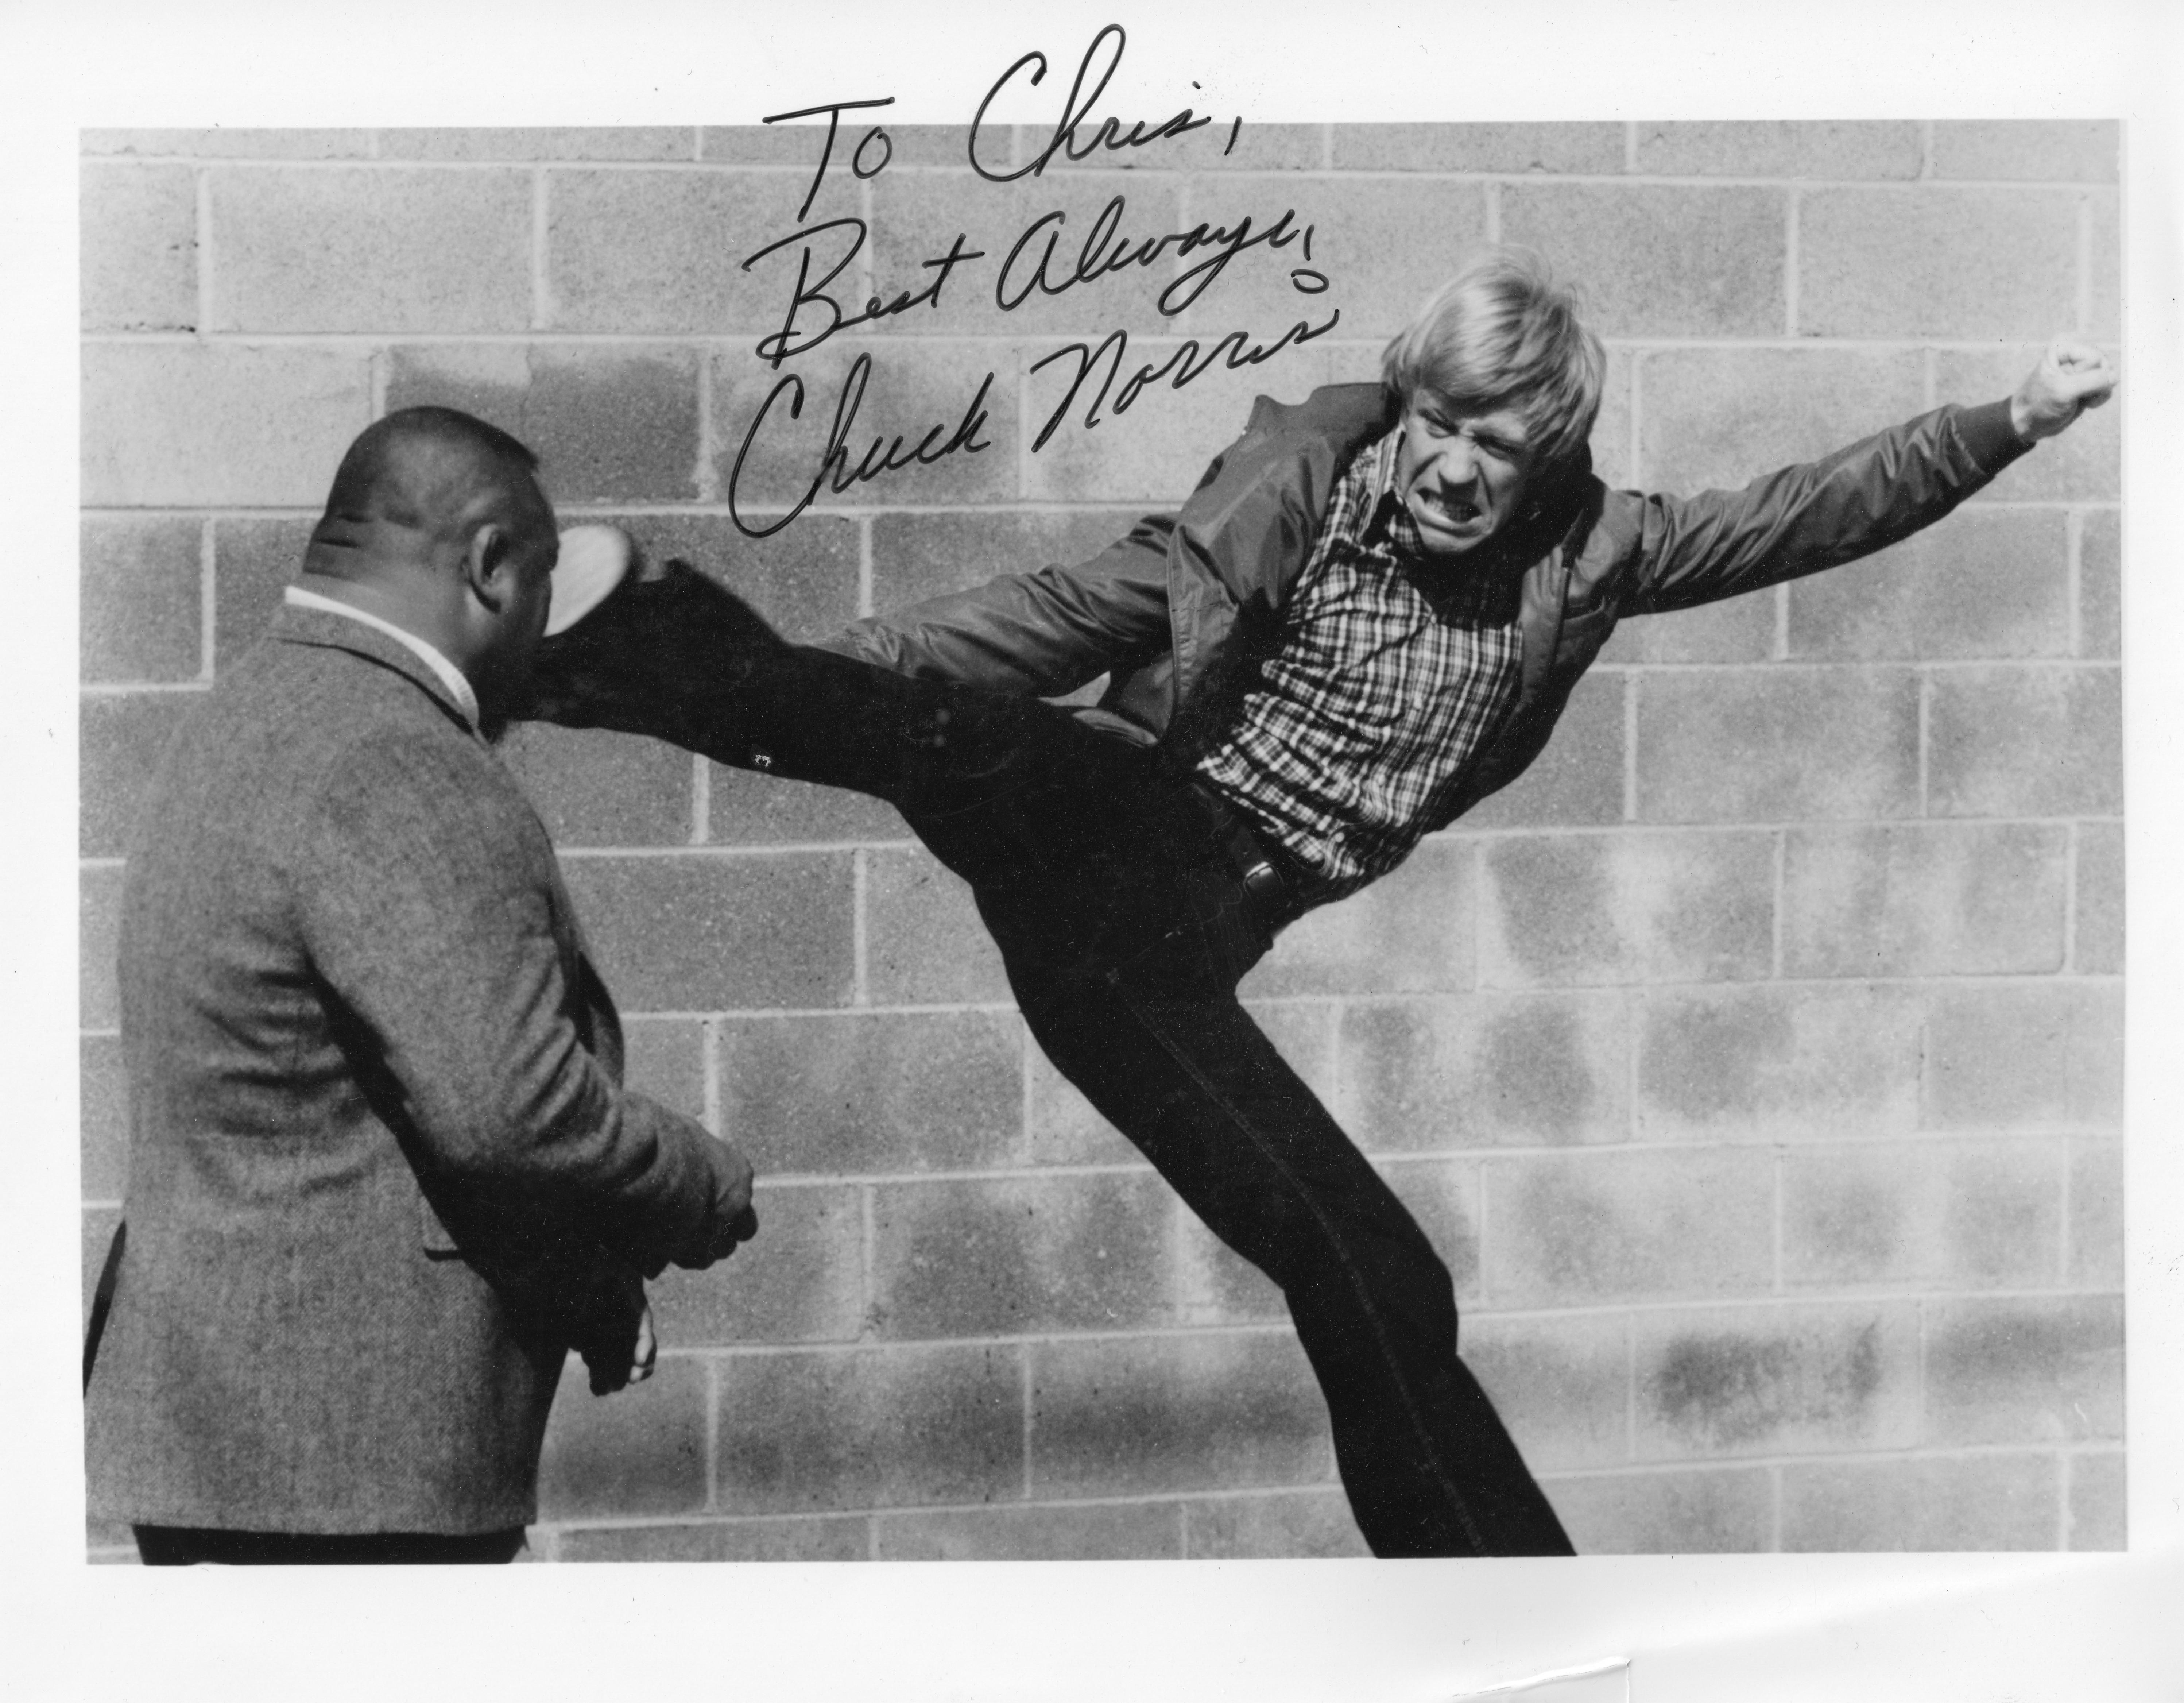 Chuck Norris Pic 1001